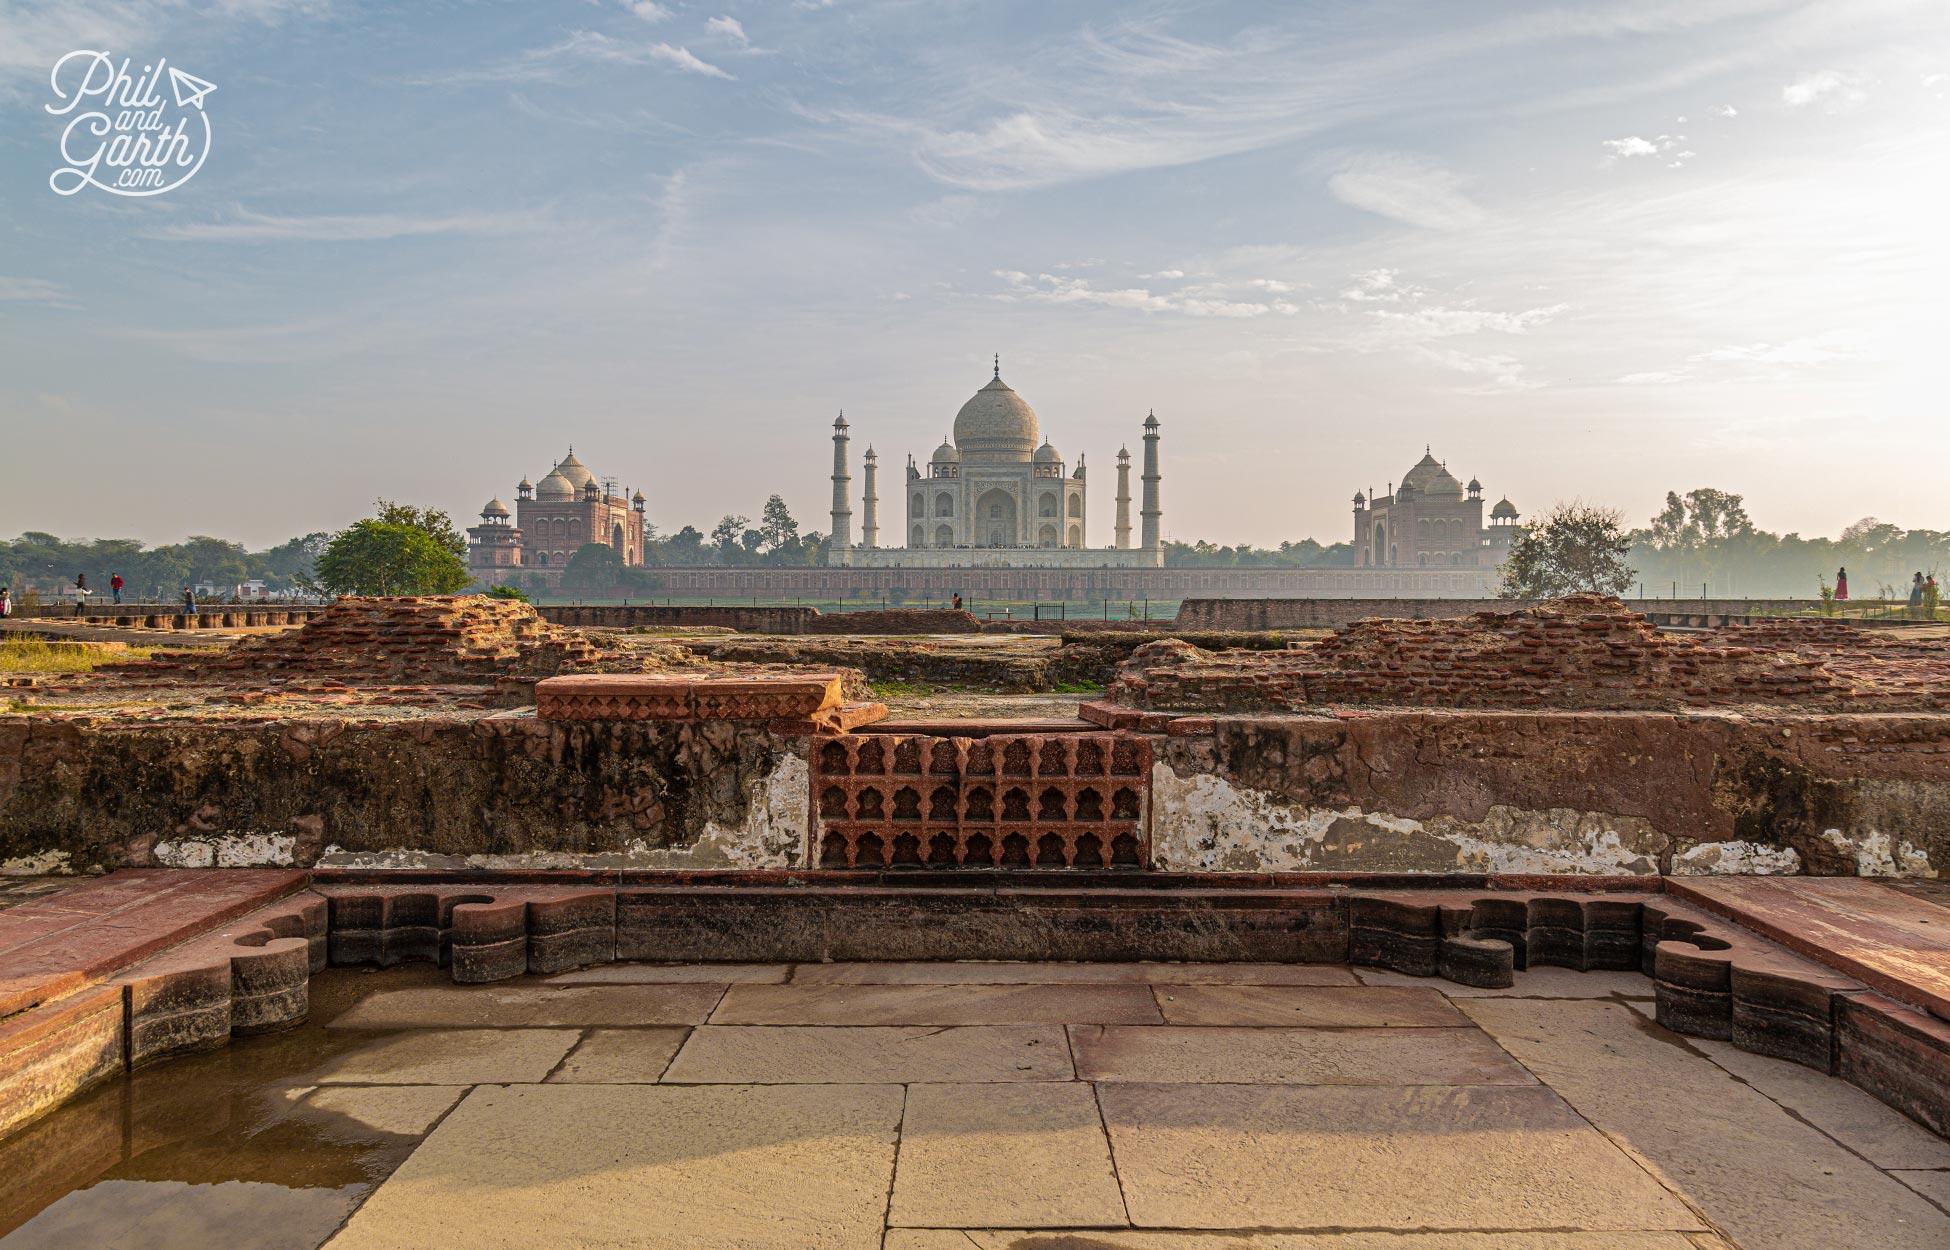 The foundations of theBlack Taj Mahal in Mehtab Bagh